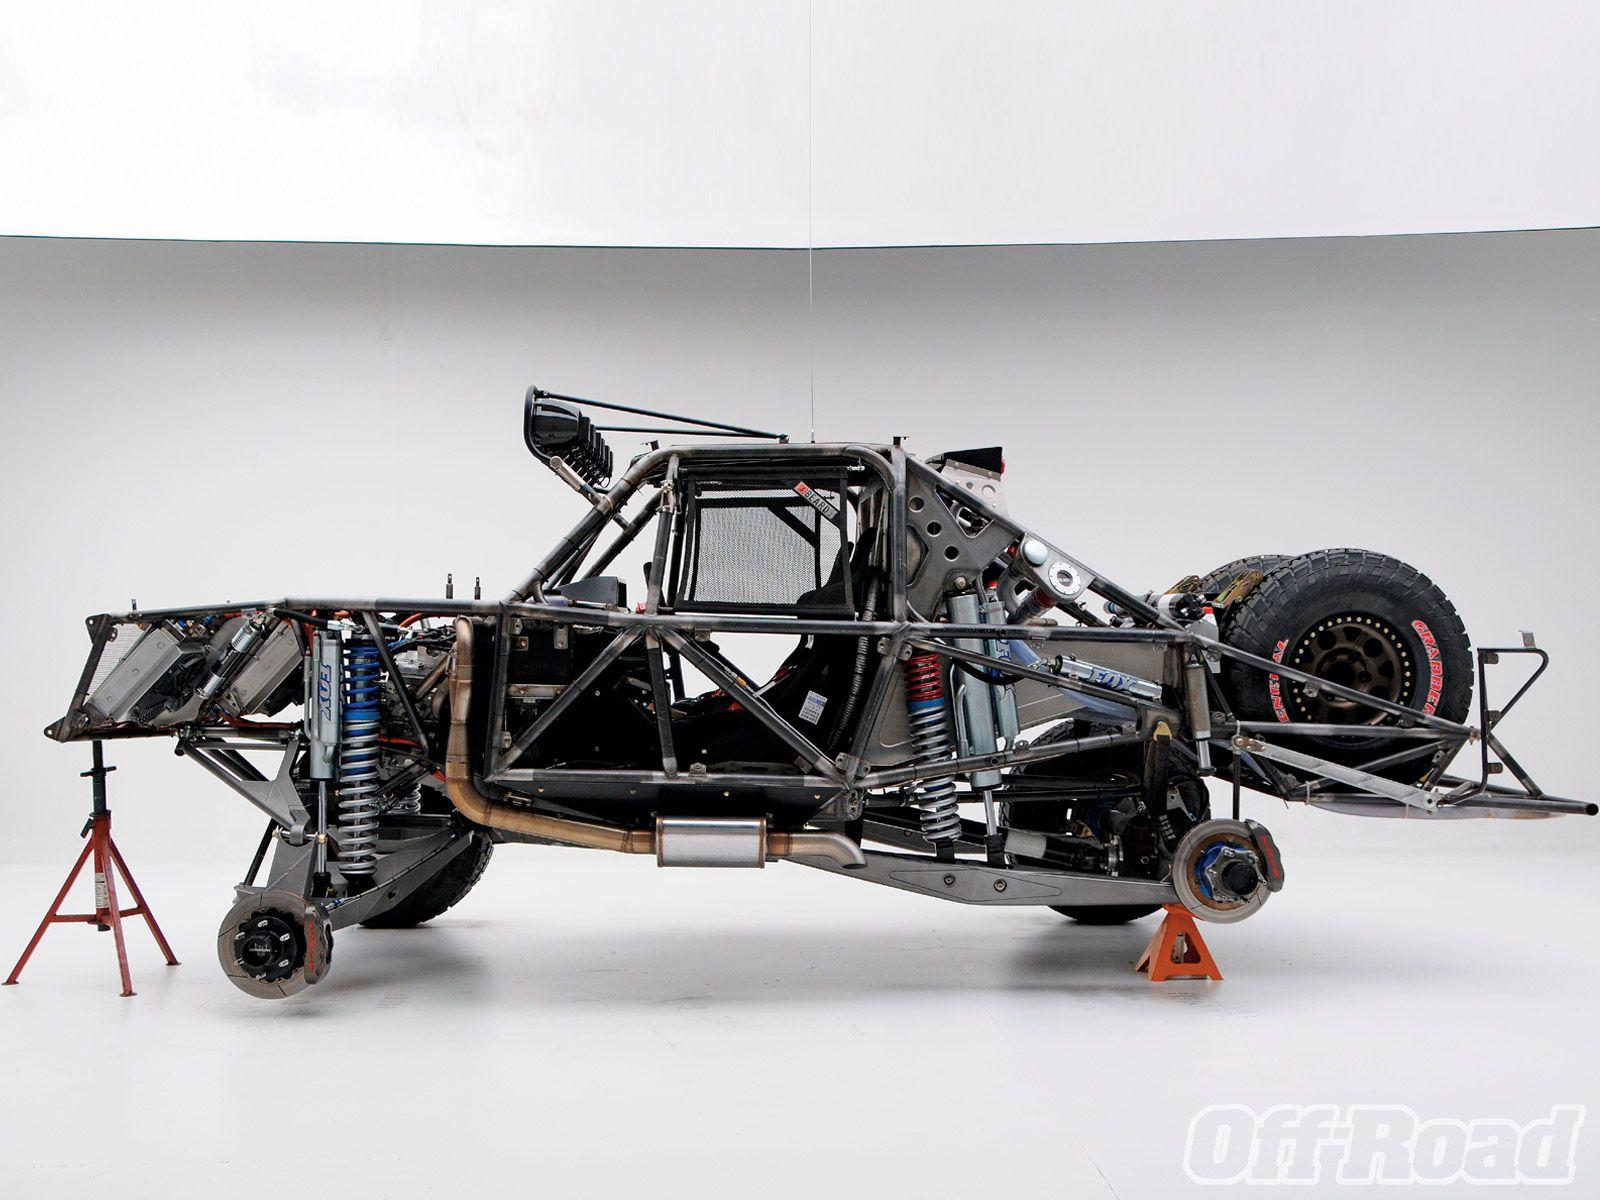 rally truck suspension - Google Search | Trucks | Pinterest | Rally ...